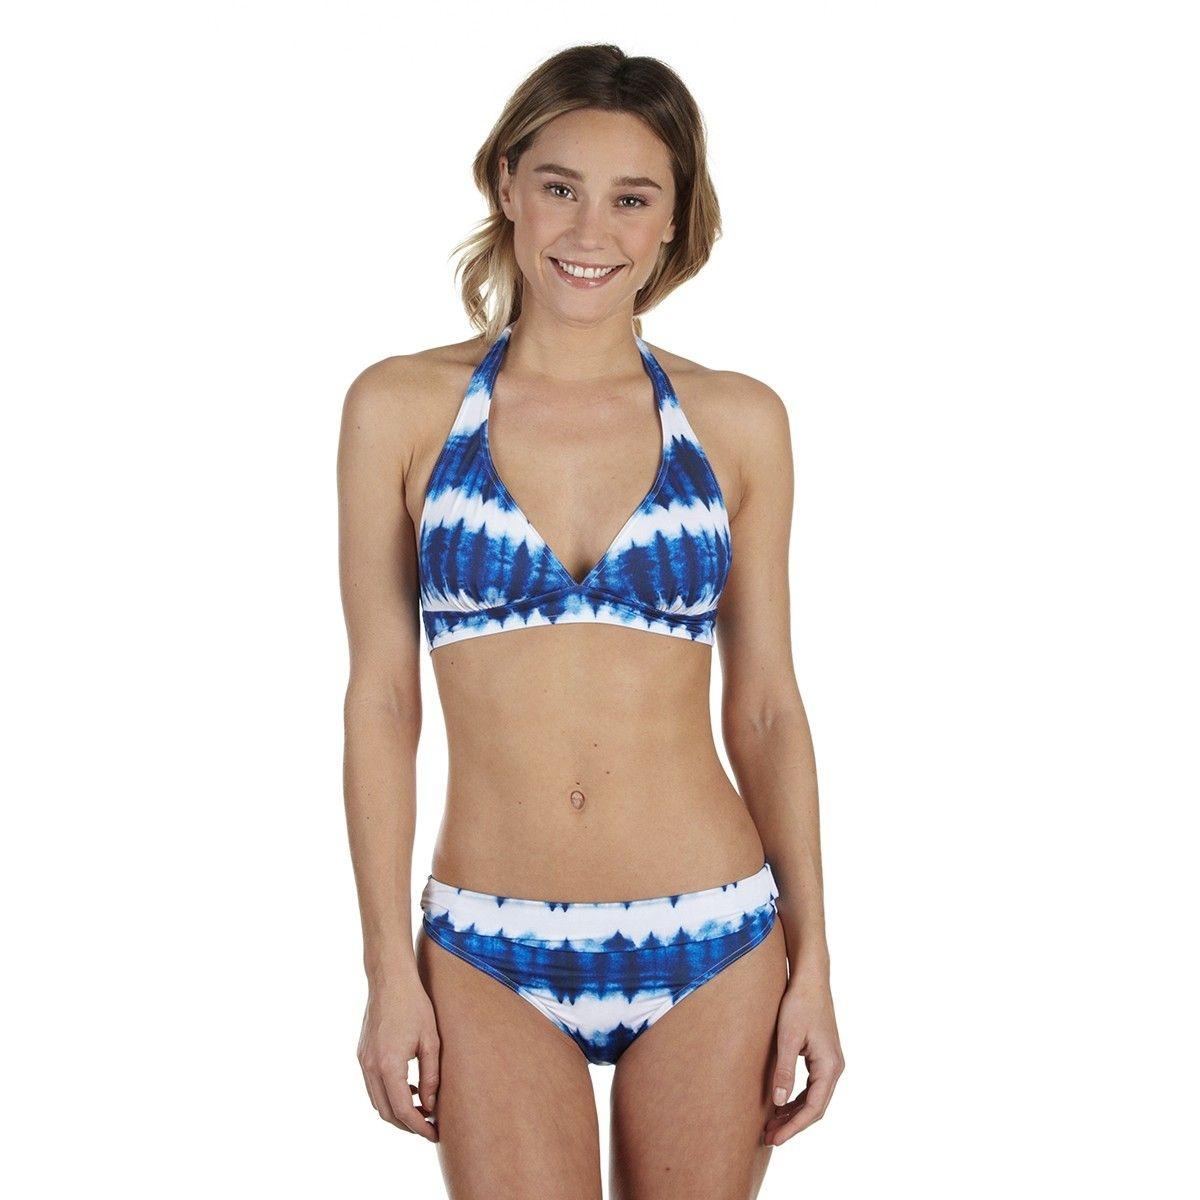 d541908e17 Haut de maillot de bain Triangle foulard mousses amovibles Hoang.  BLUELOBSTER